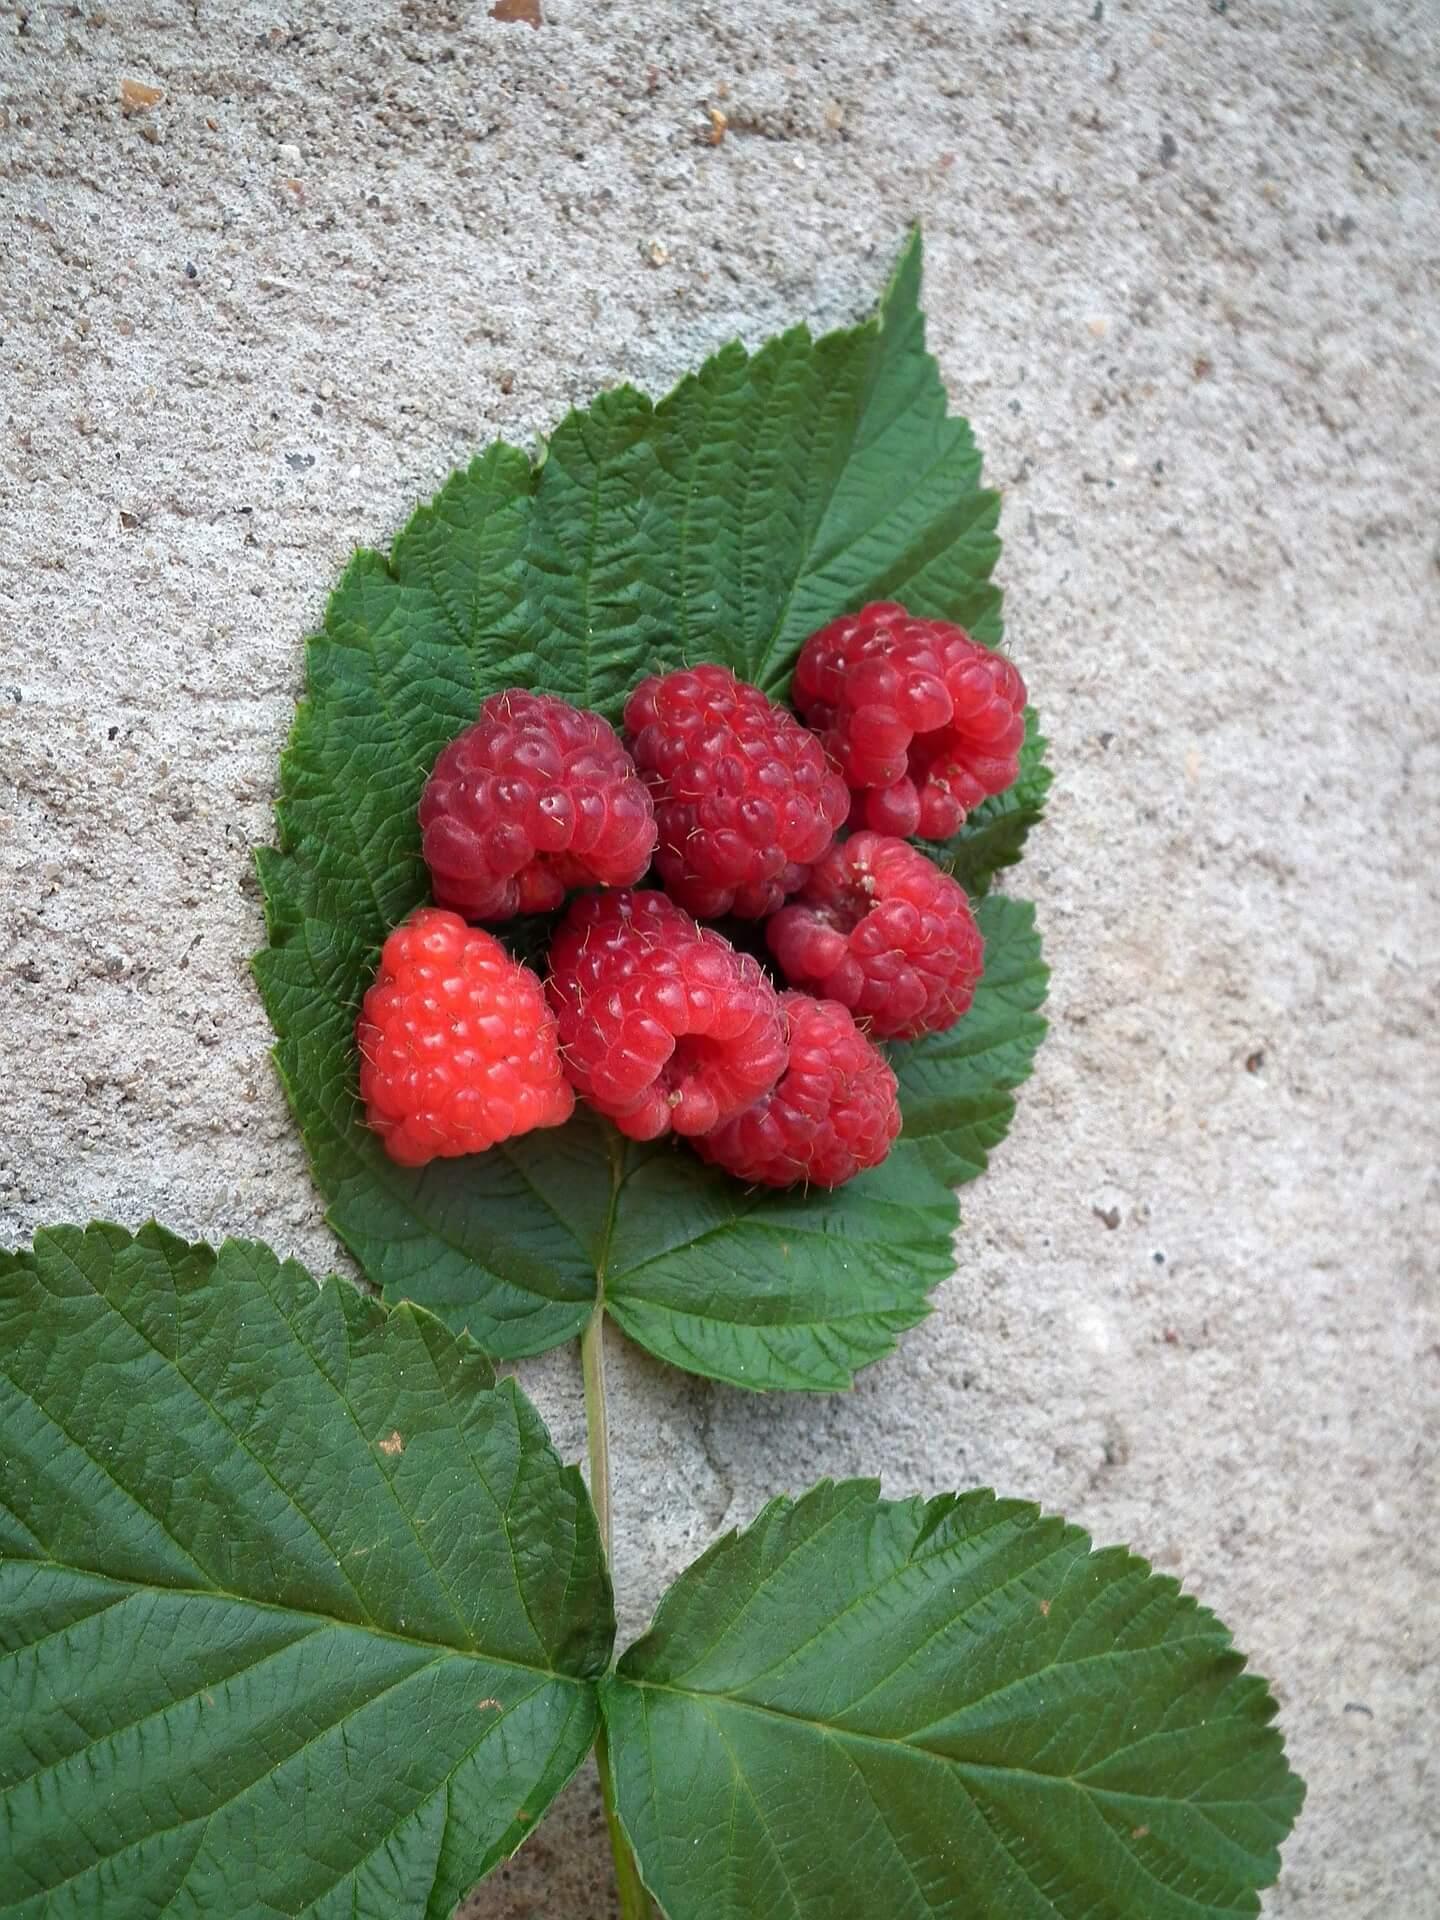 Raspberry Leaf Tea PMS remedies